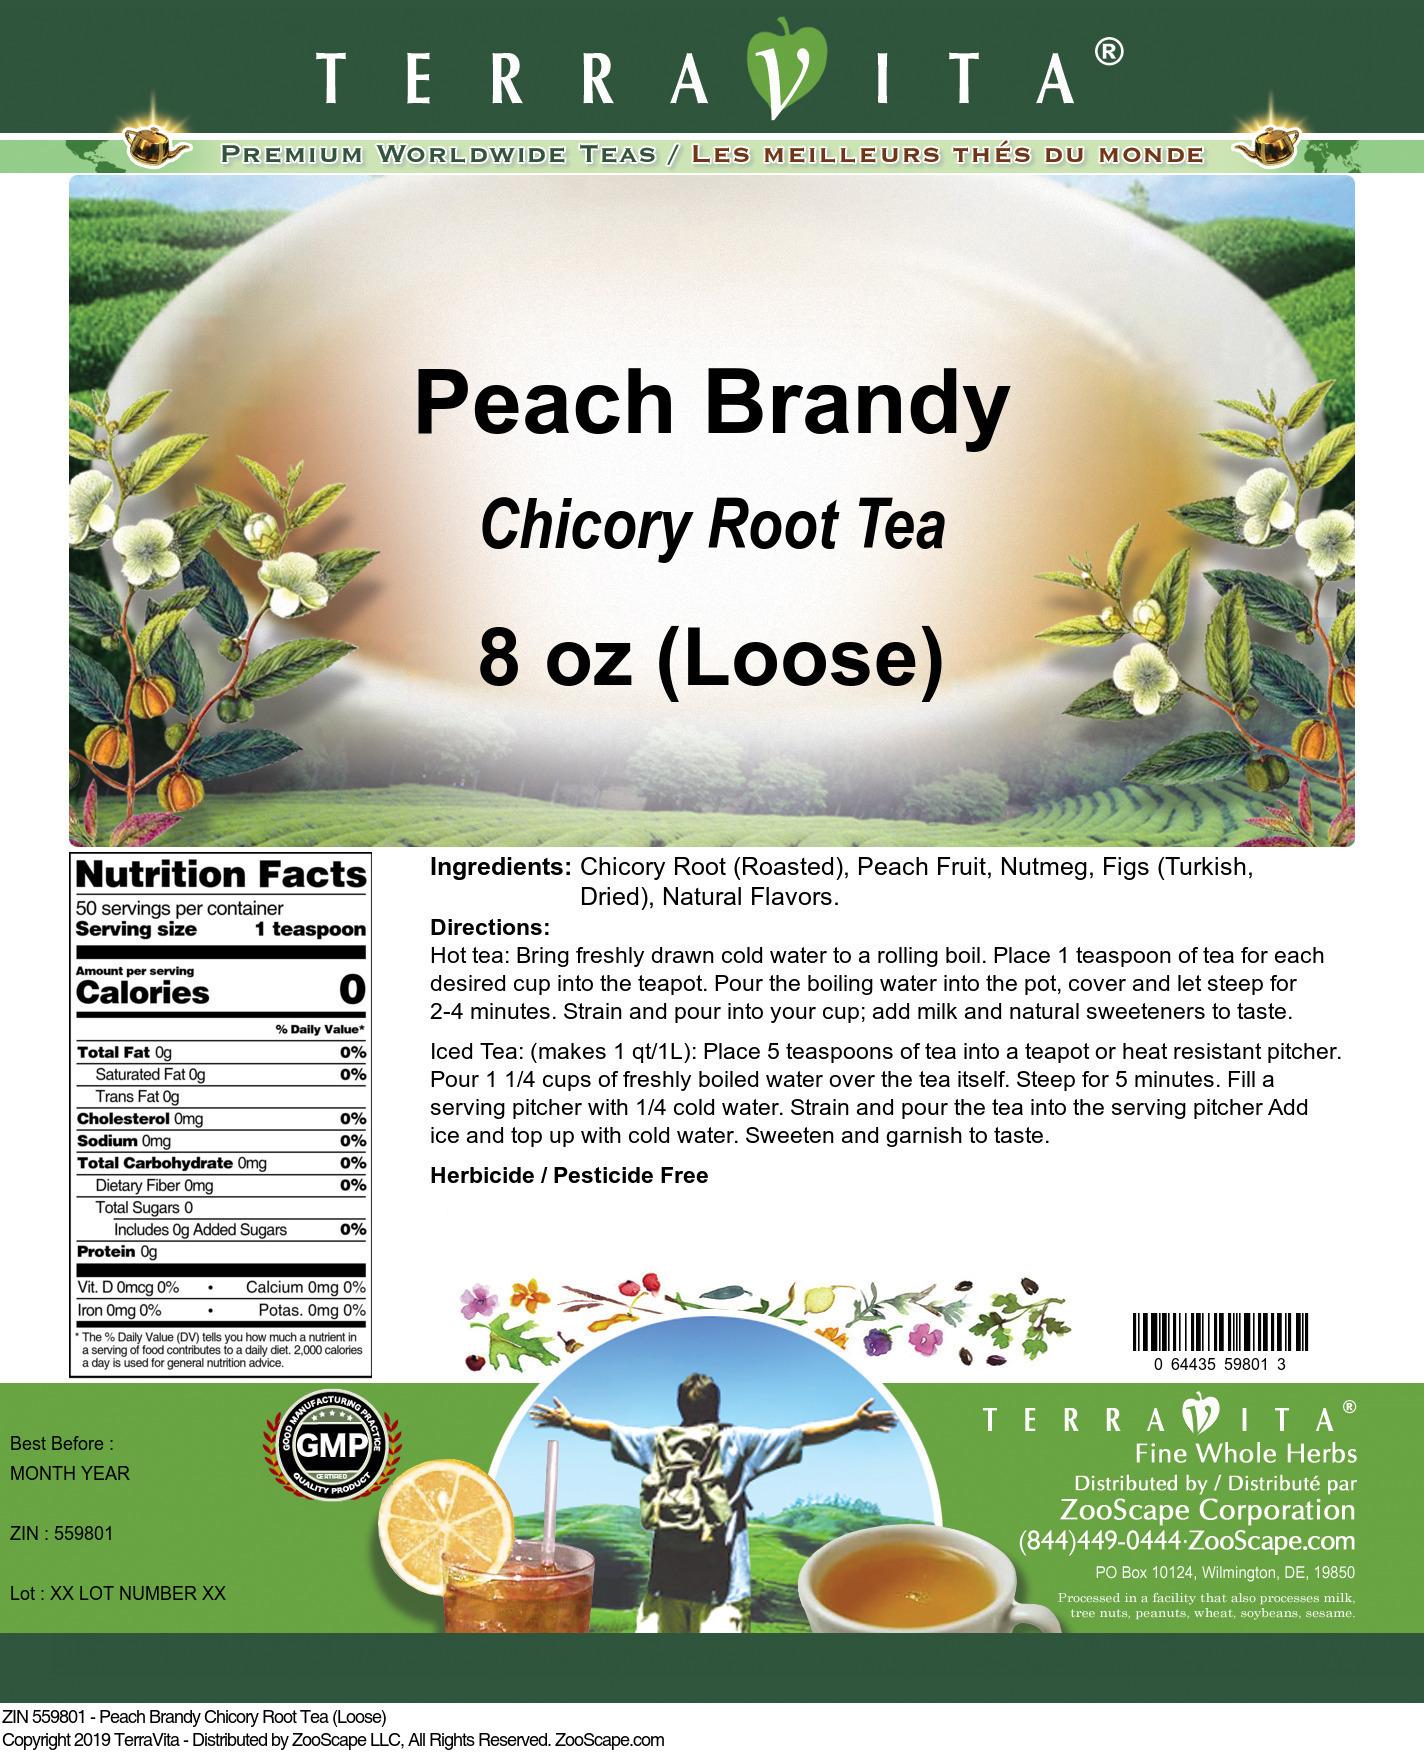 Peach Brandy Chicory Root Tea (Loose)